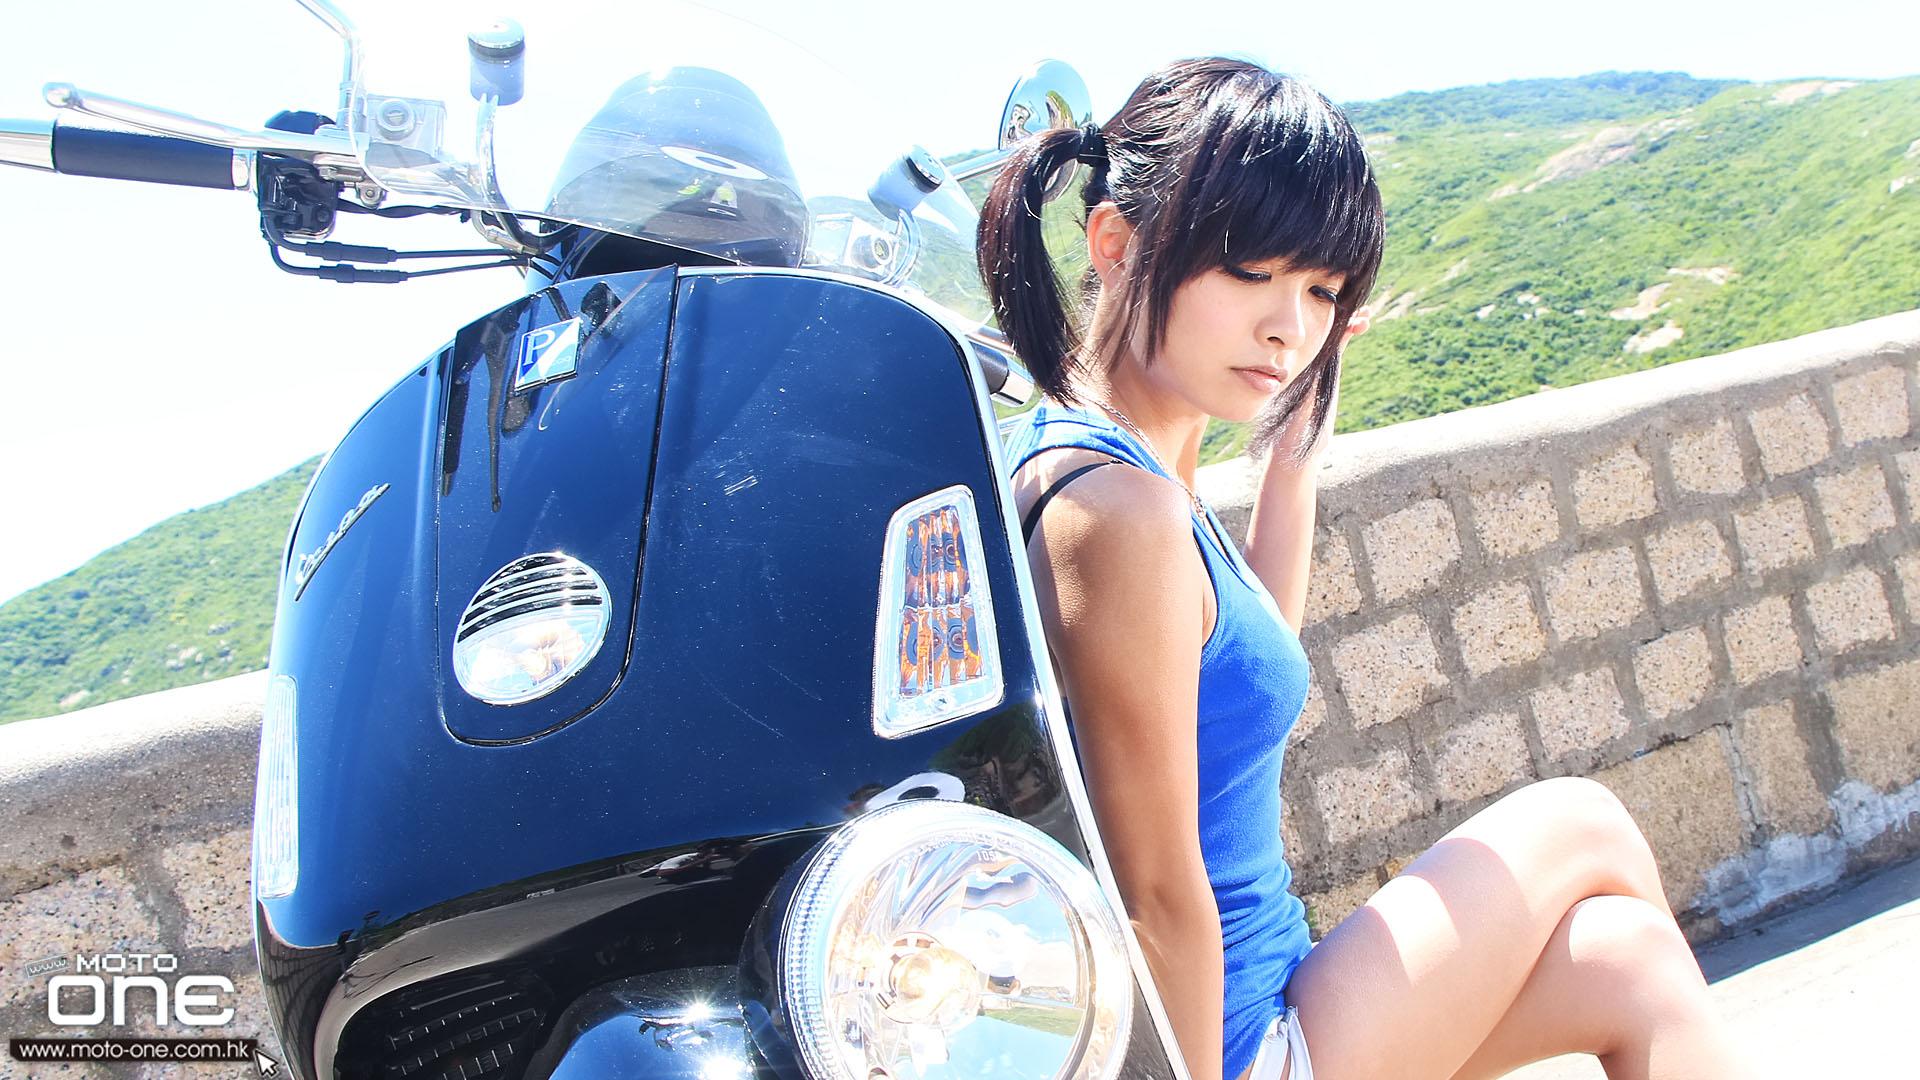 2013 vespa gtv 300ie x 小希《疯狂女假面》